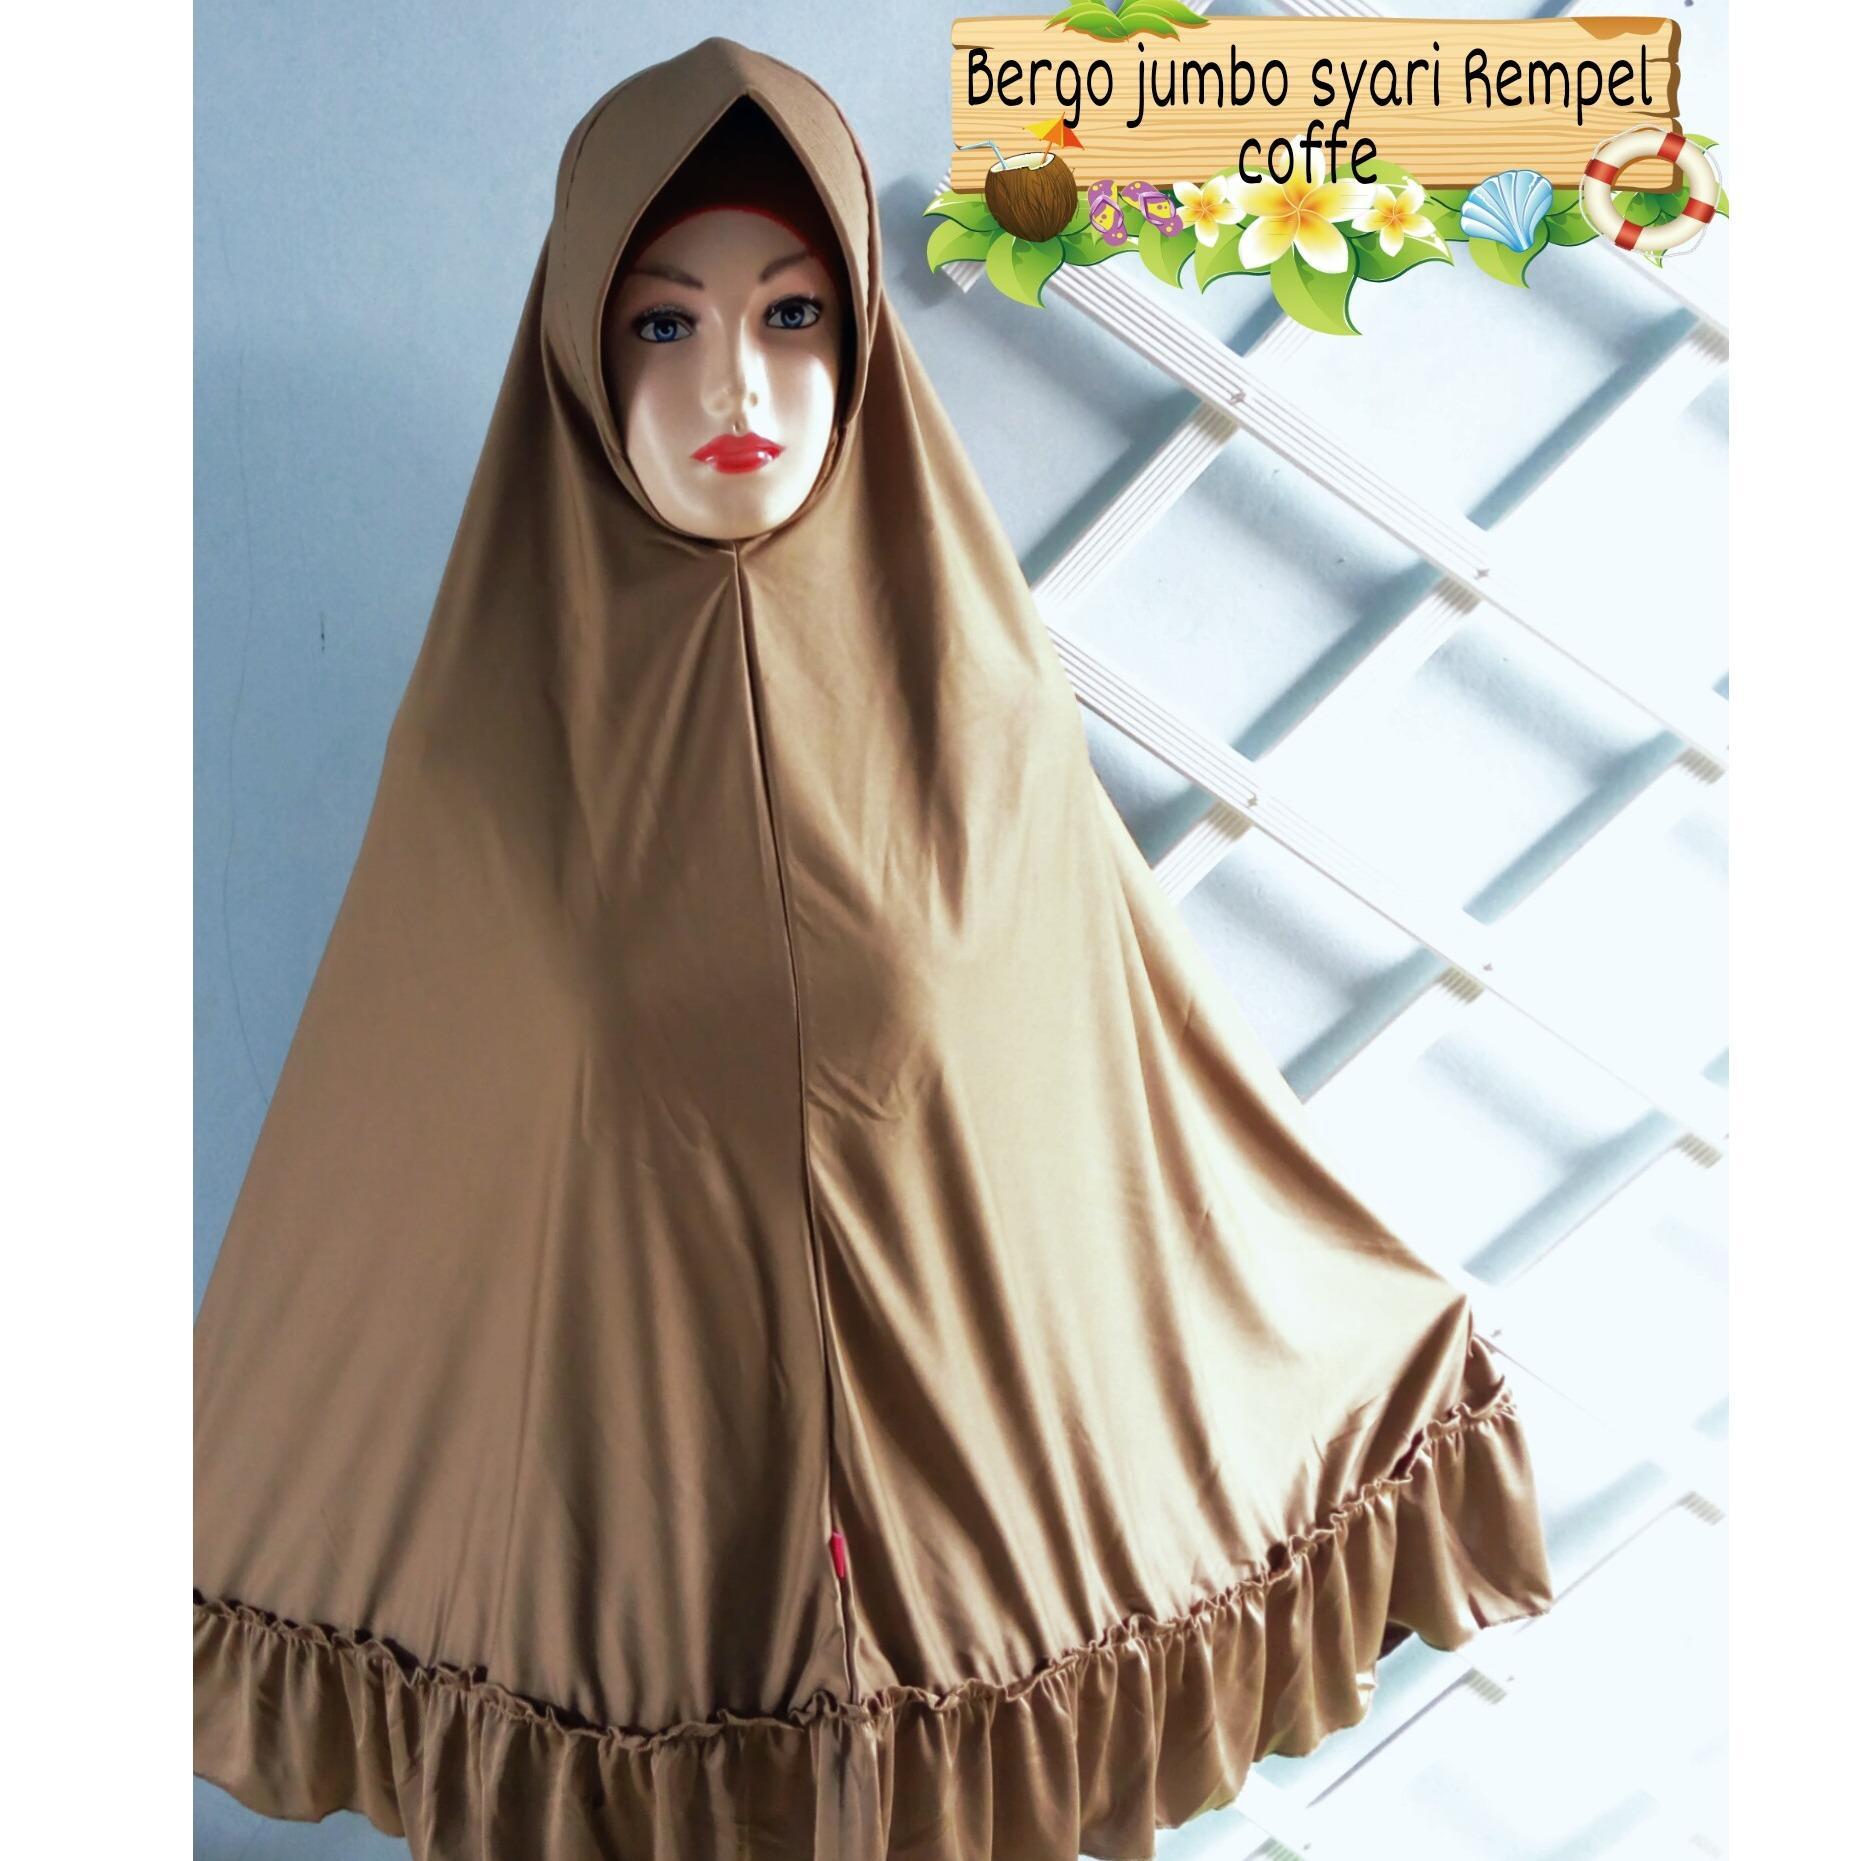 Promo Jilbab Kerudung Hijab Khimar Syar'i Bergo Jumbo Besar Syari Rempel - tukiyem13